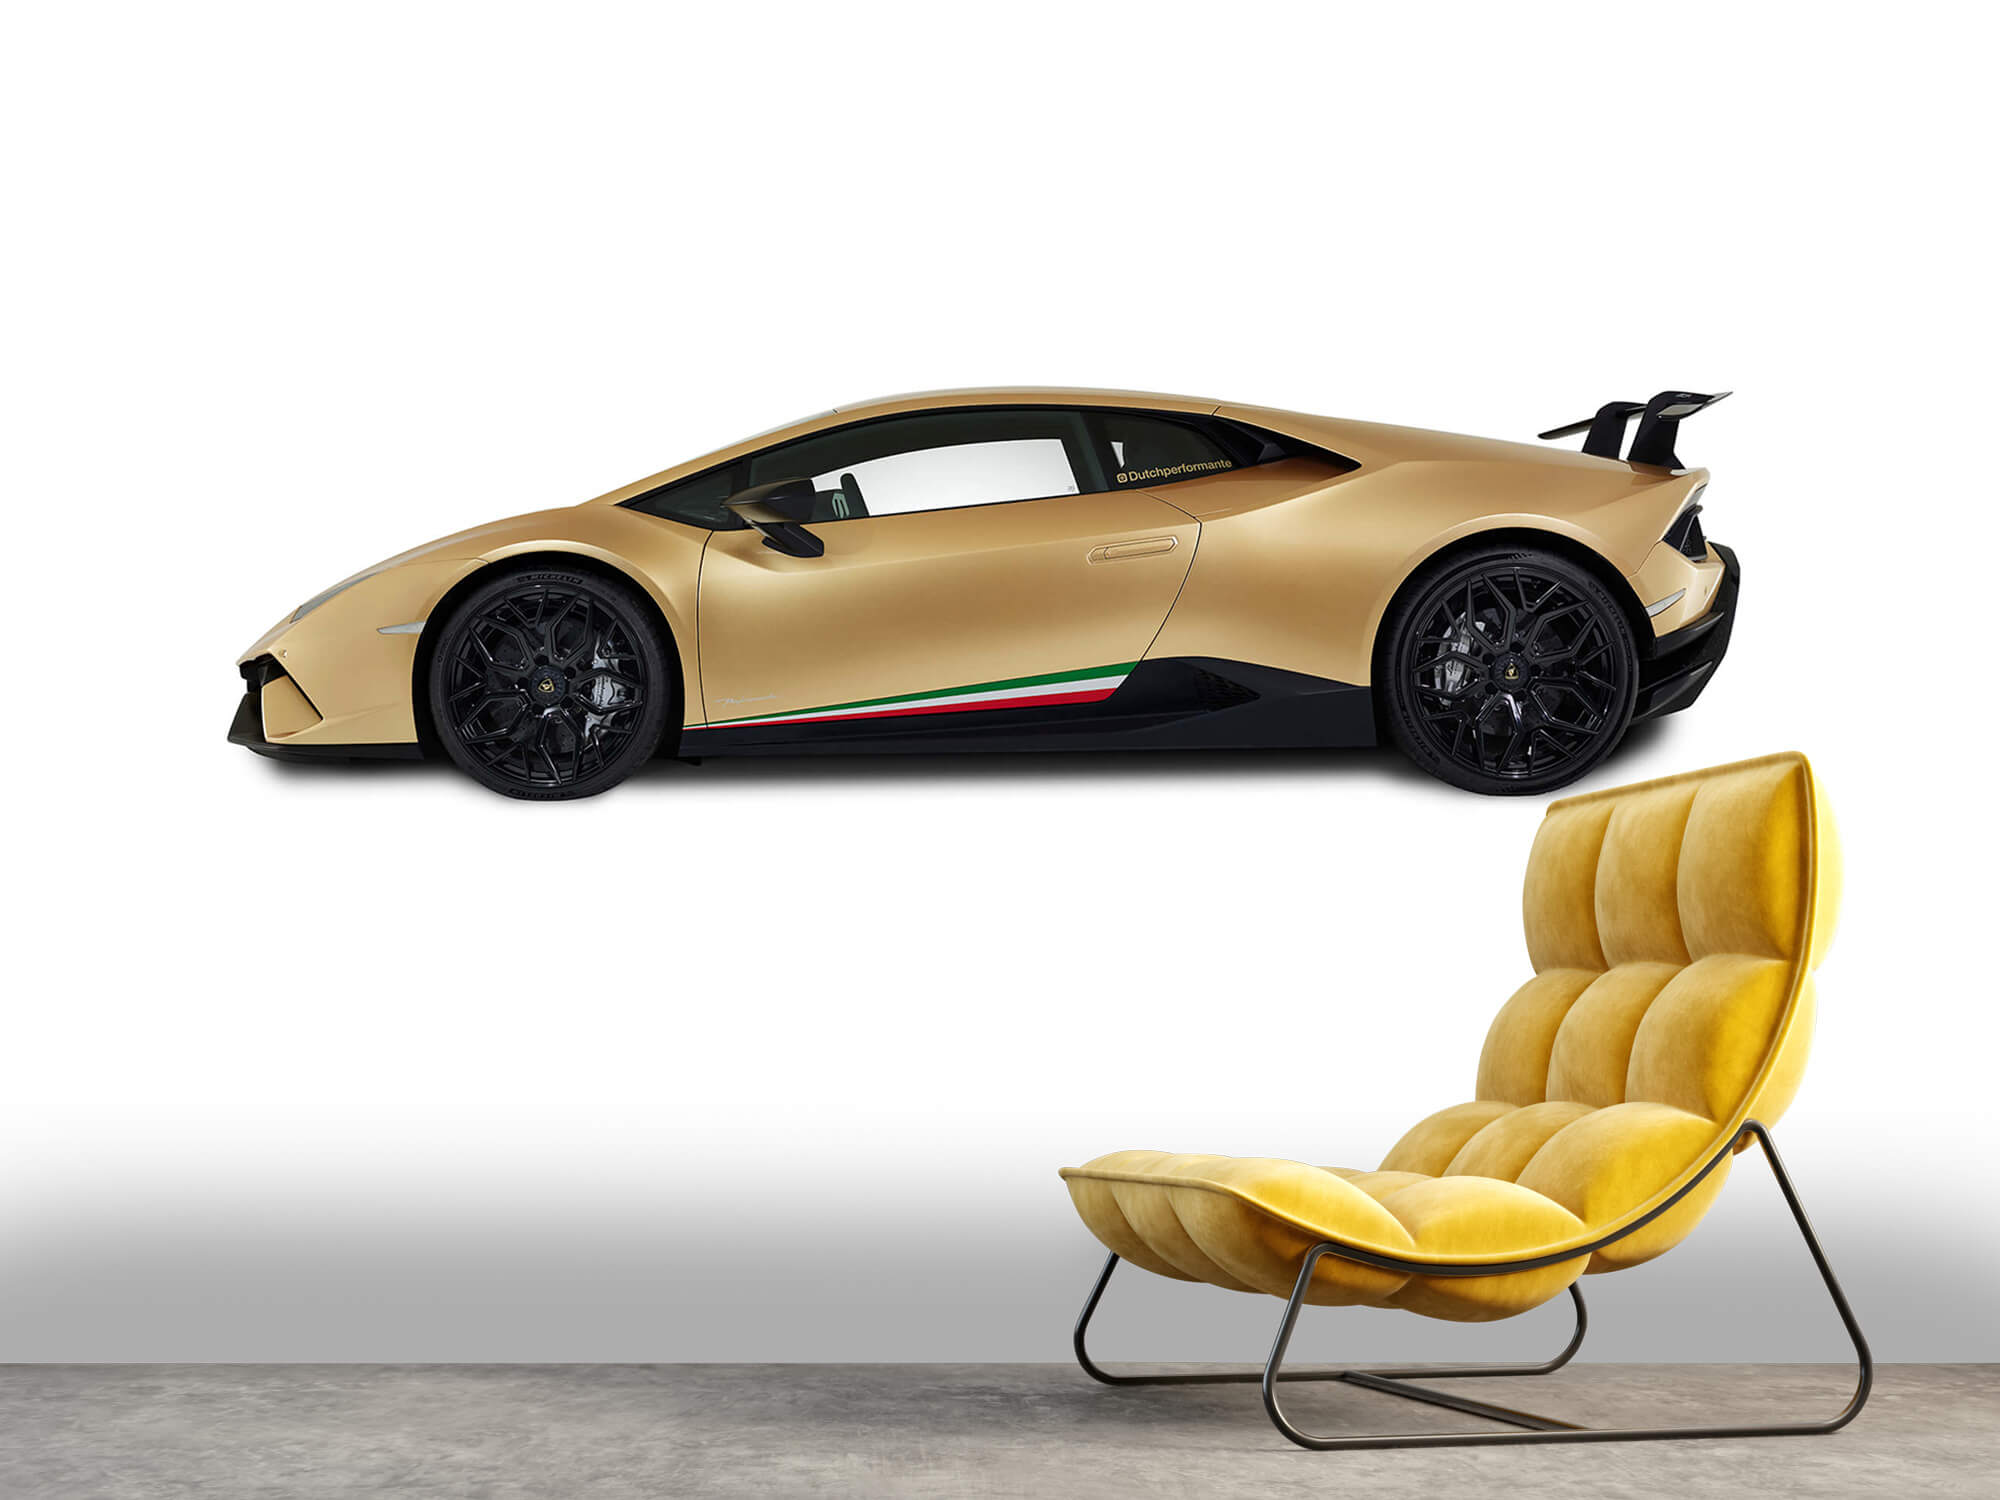 Wallpaper Lamborghini Huracán - Zijkant, wit 2